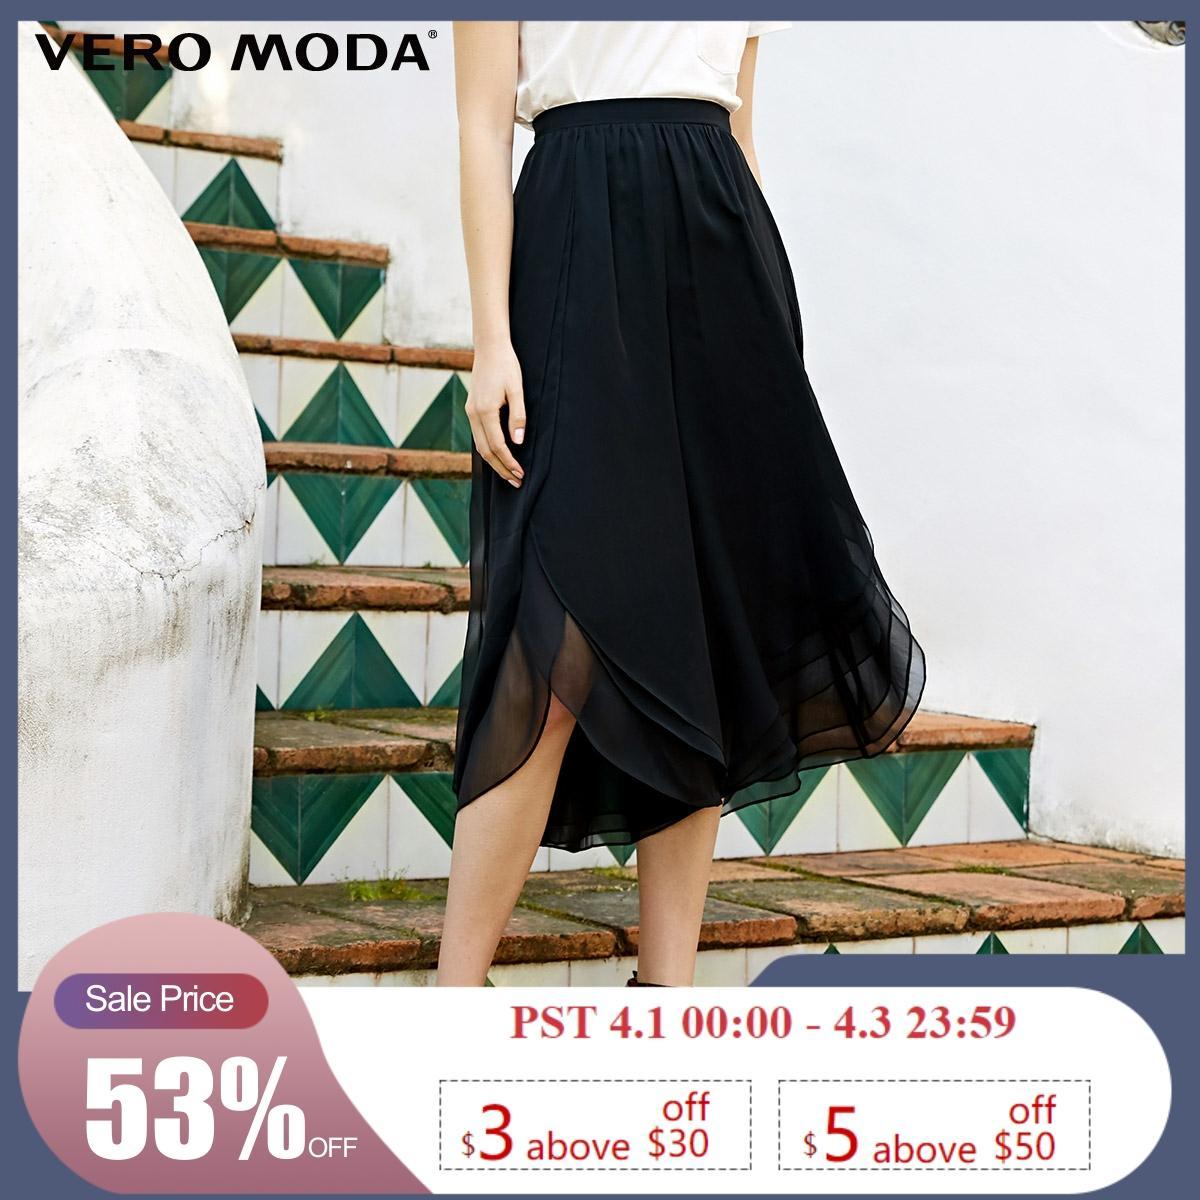 Vero Moda New Arrivals Ins Style Draped Capri Pants   31926J533